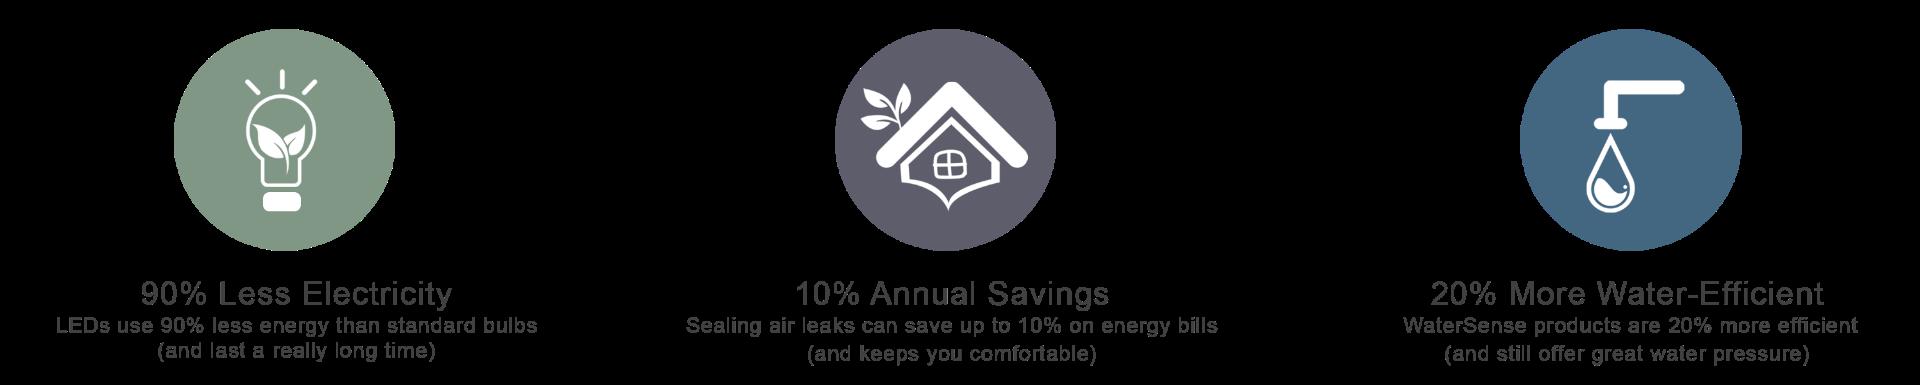 Energy-efficient product savings